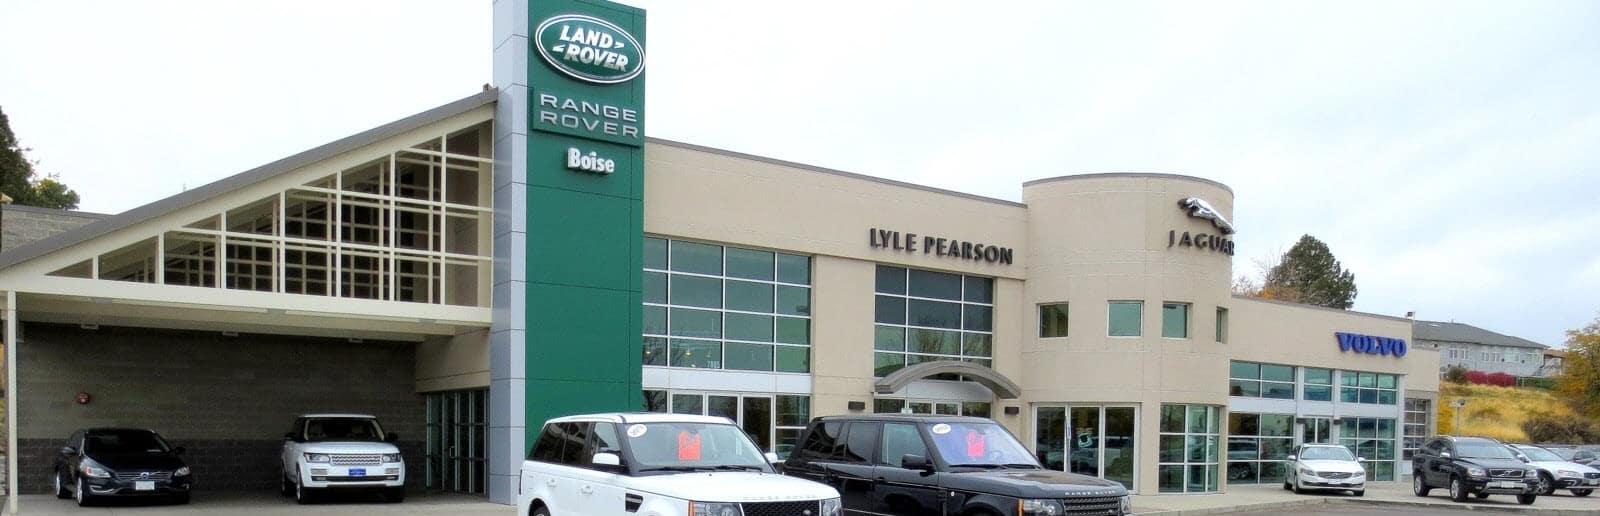 Land Rover Dealership >> Land Rover Dealer Near Me Land Rover Boise